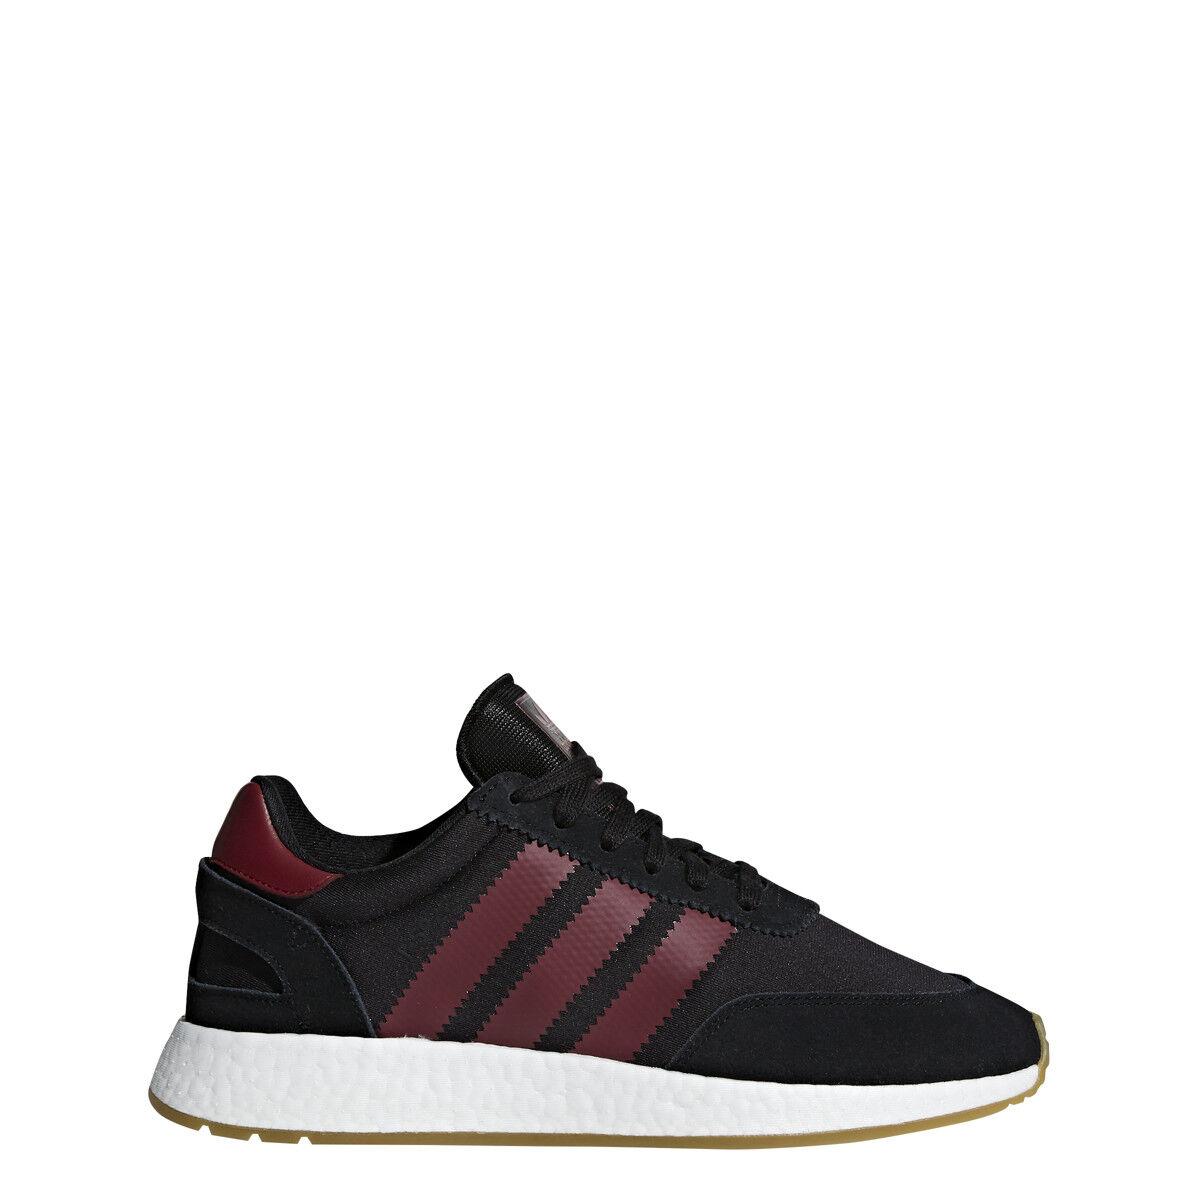 Adidas Mens I-5923 Black Burgundy White - B37946